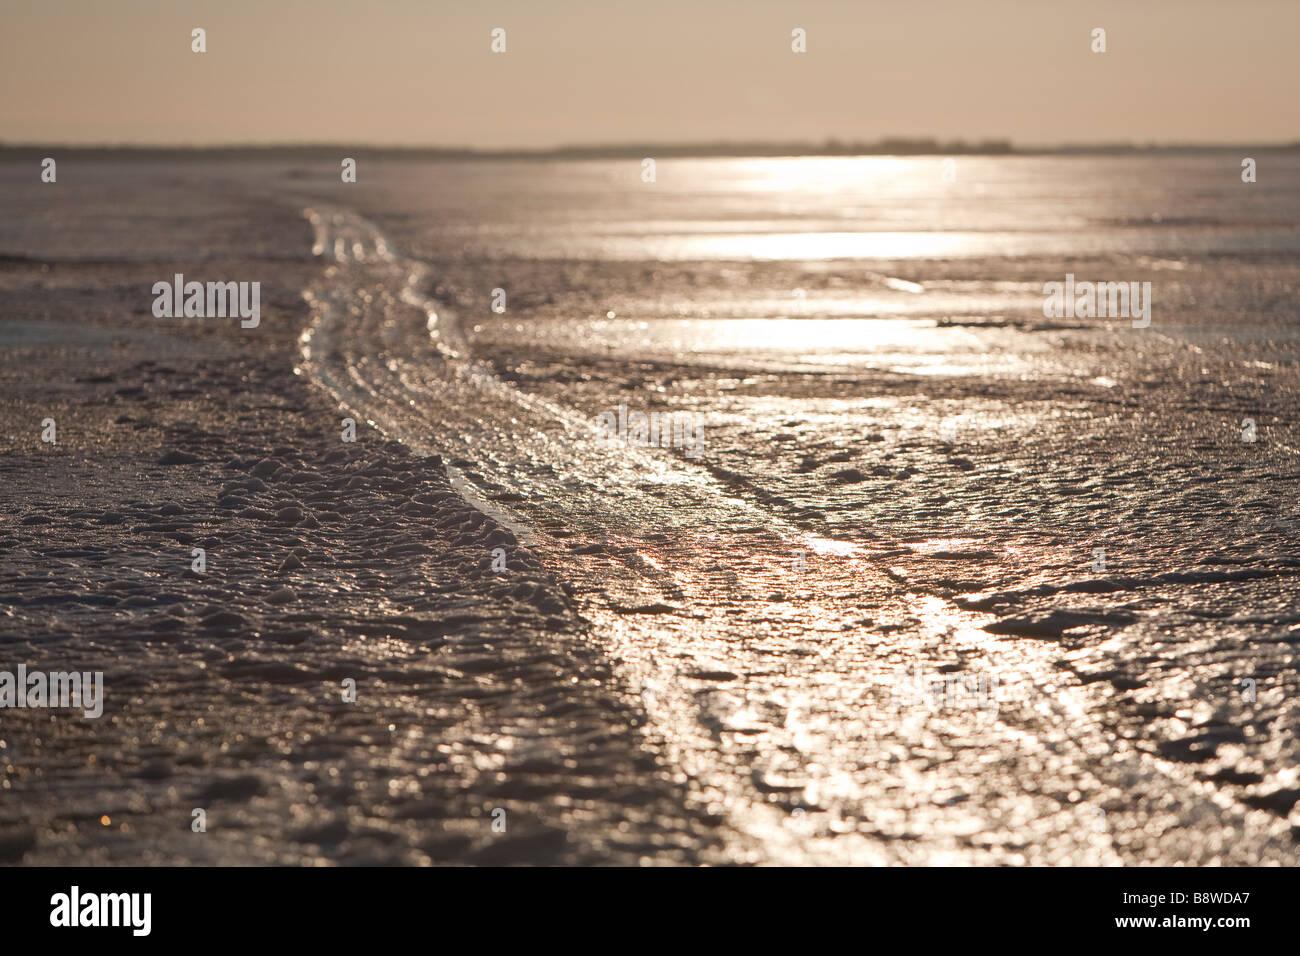 Gefrorene Motorschlitten Spur auf dem Meereis, Finnland Stockbild